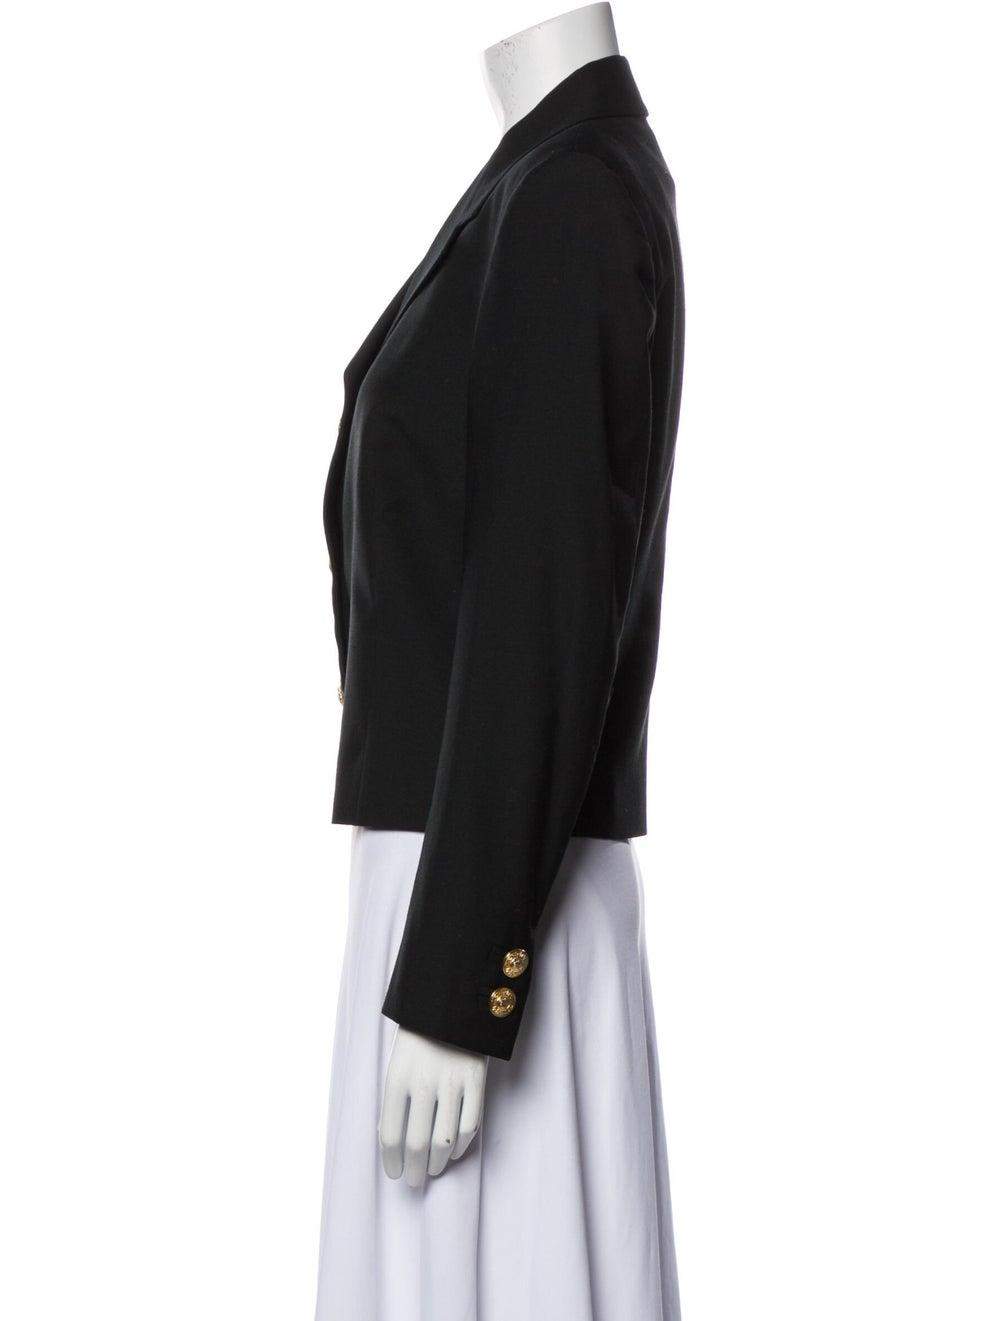 Gianni Versace Wool Blazer Wool - image 2